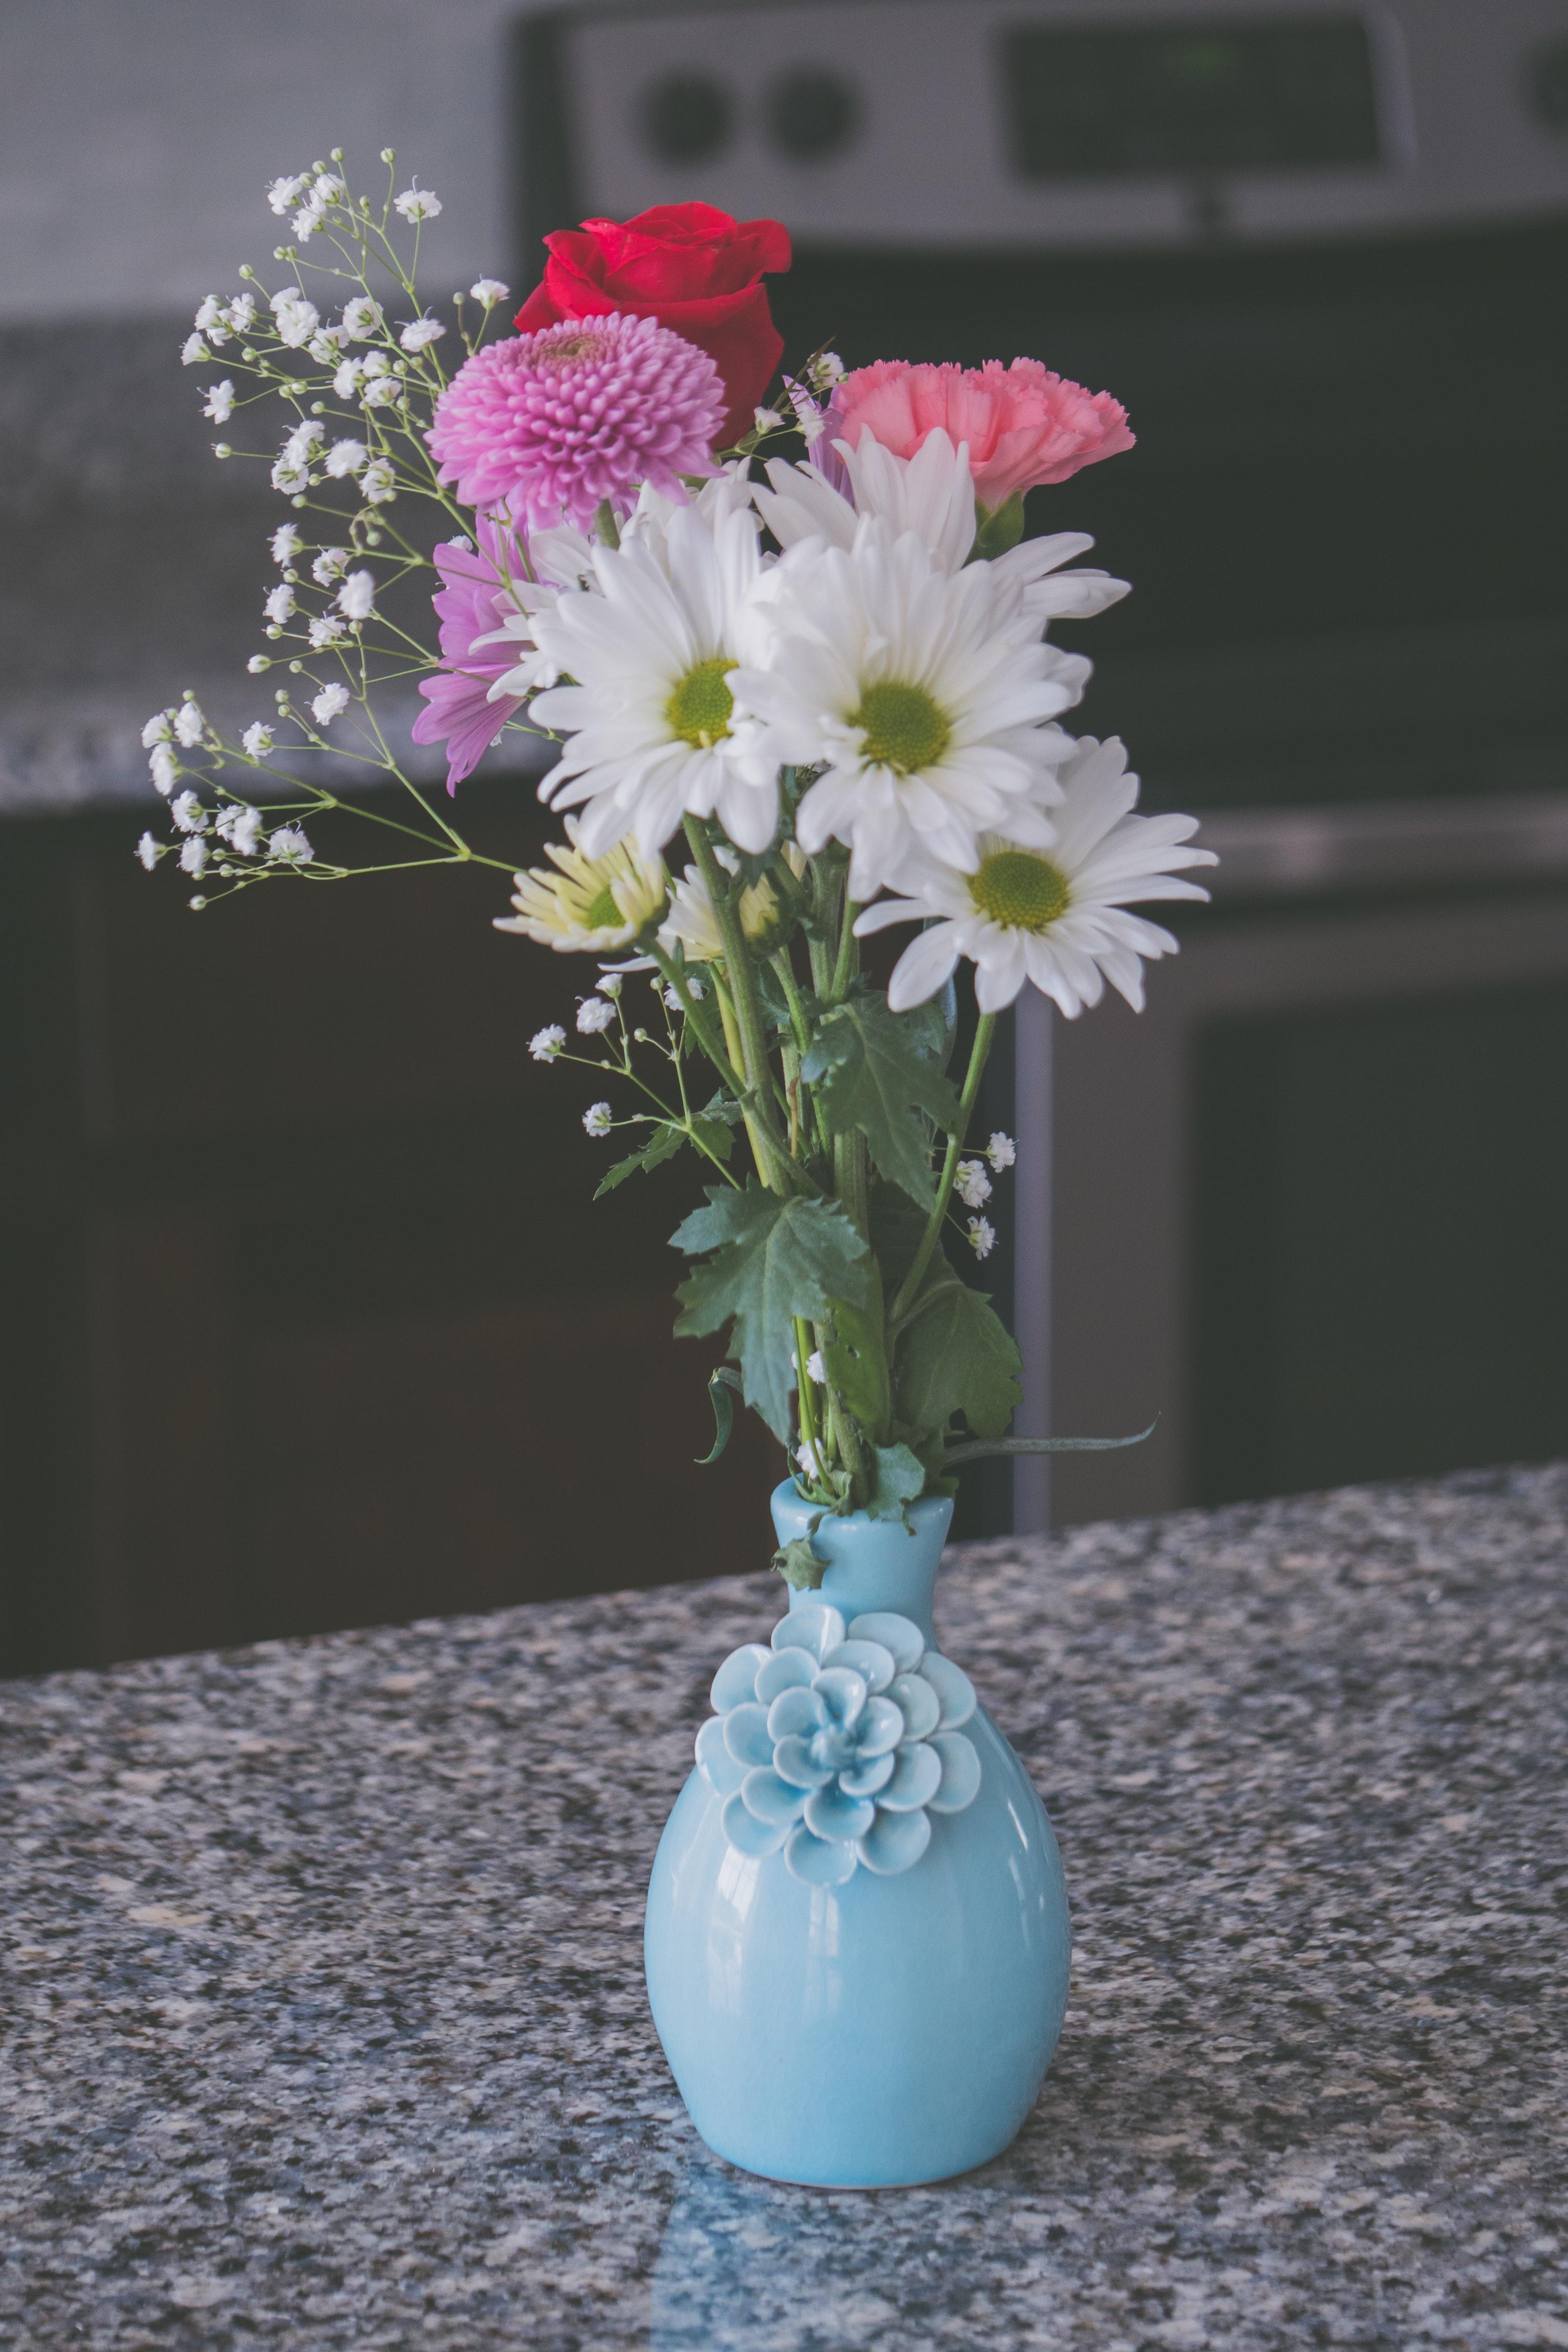 1000 Interesting Flower Vase Photos Pexels Free Stock Photos